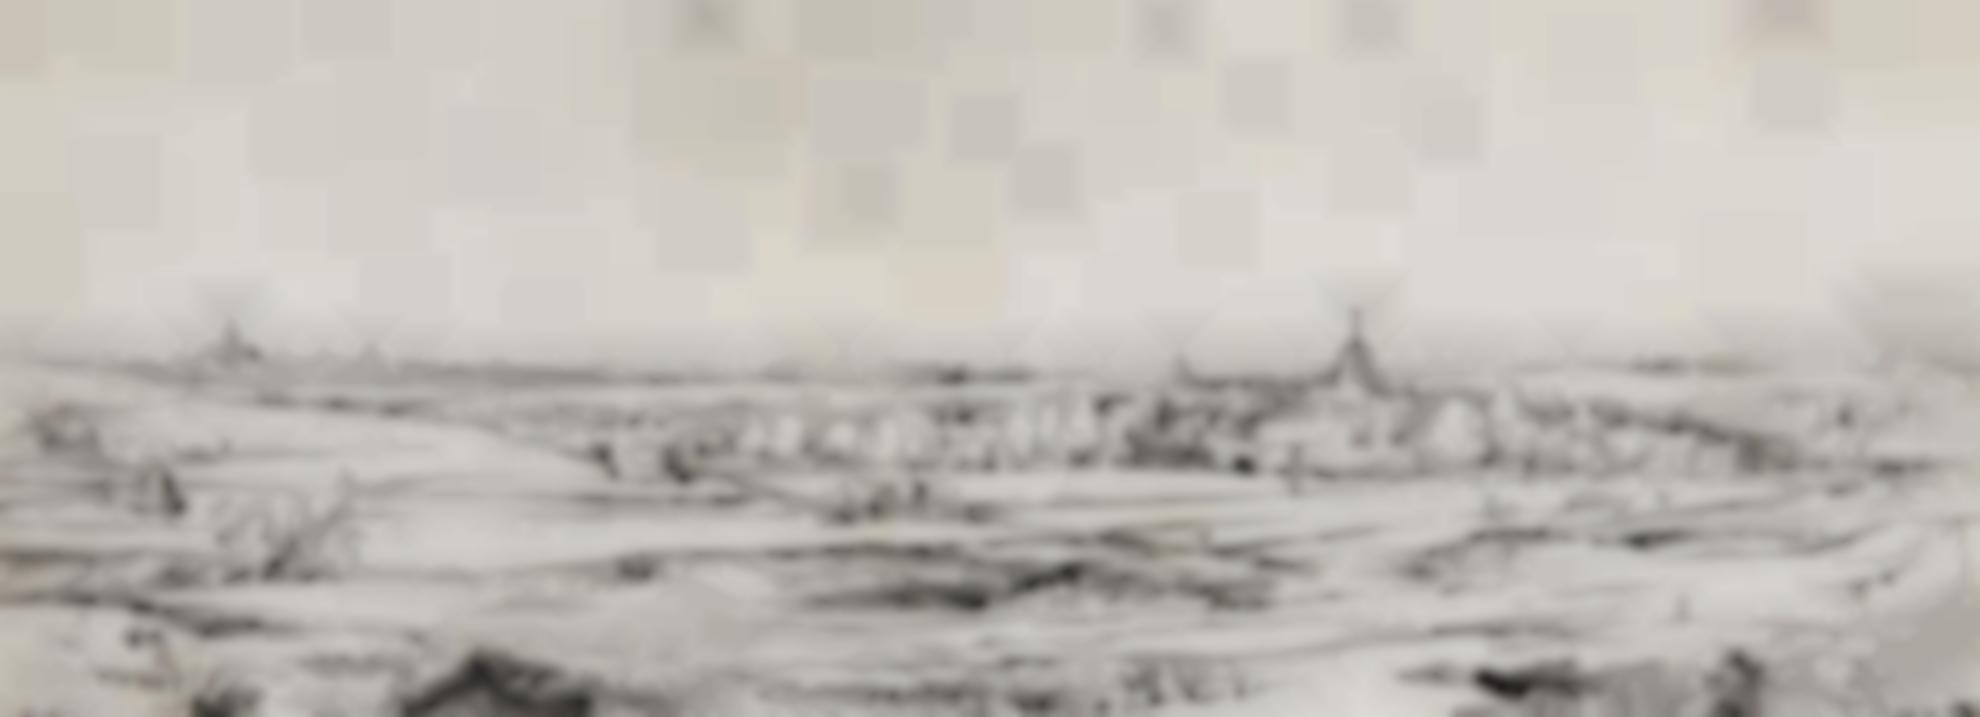 Rembrandt van Rijn-Panorama Near Bloemendael Showing The Saxenburg Estate (The Goldweighers Field) (B., Holl. 234; New Holl. 257; H. 249)-1651